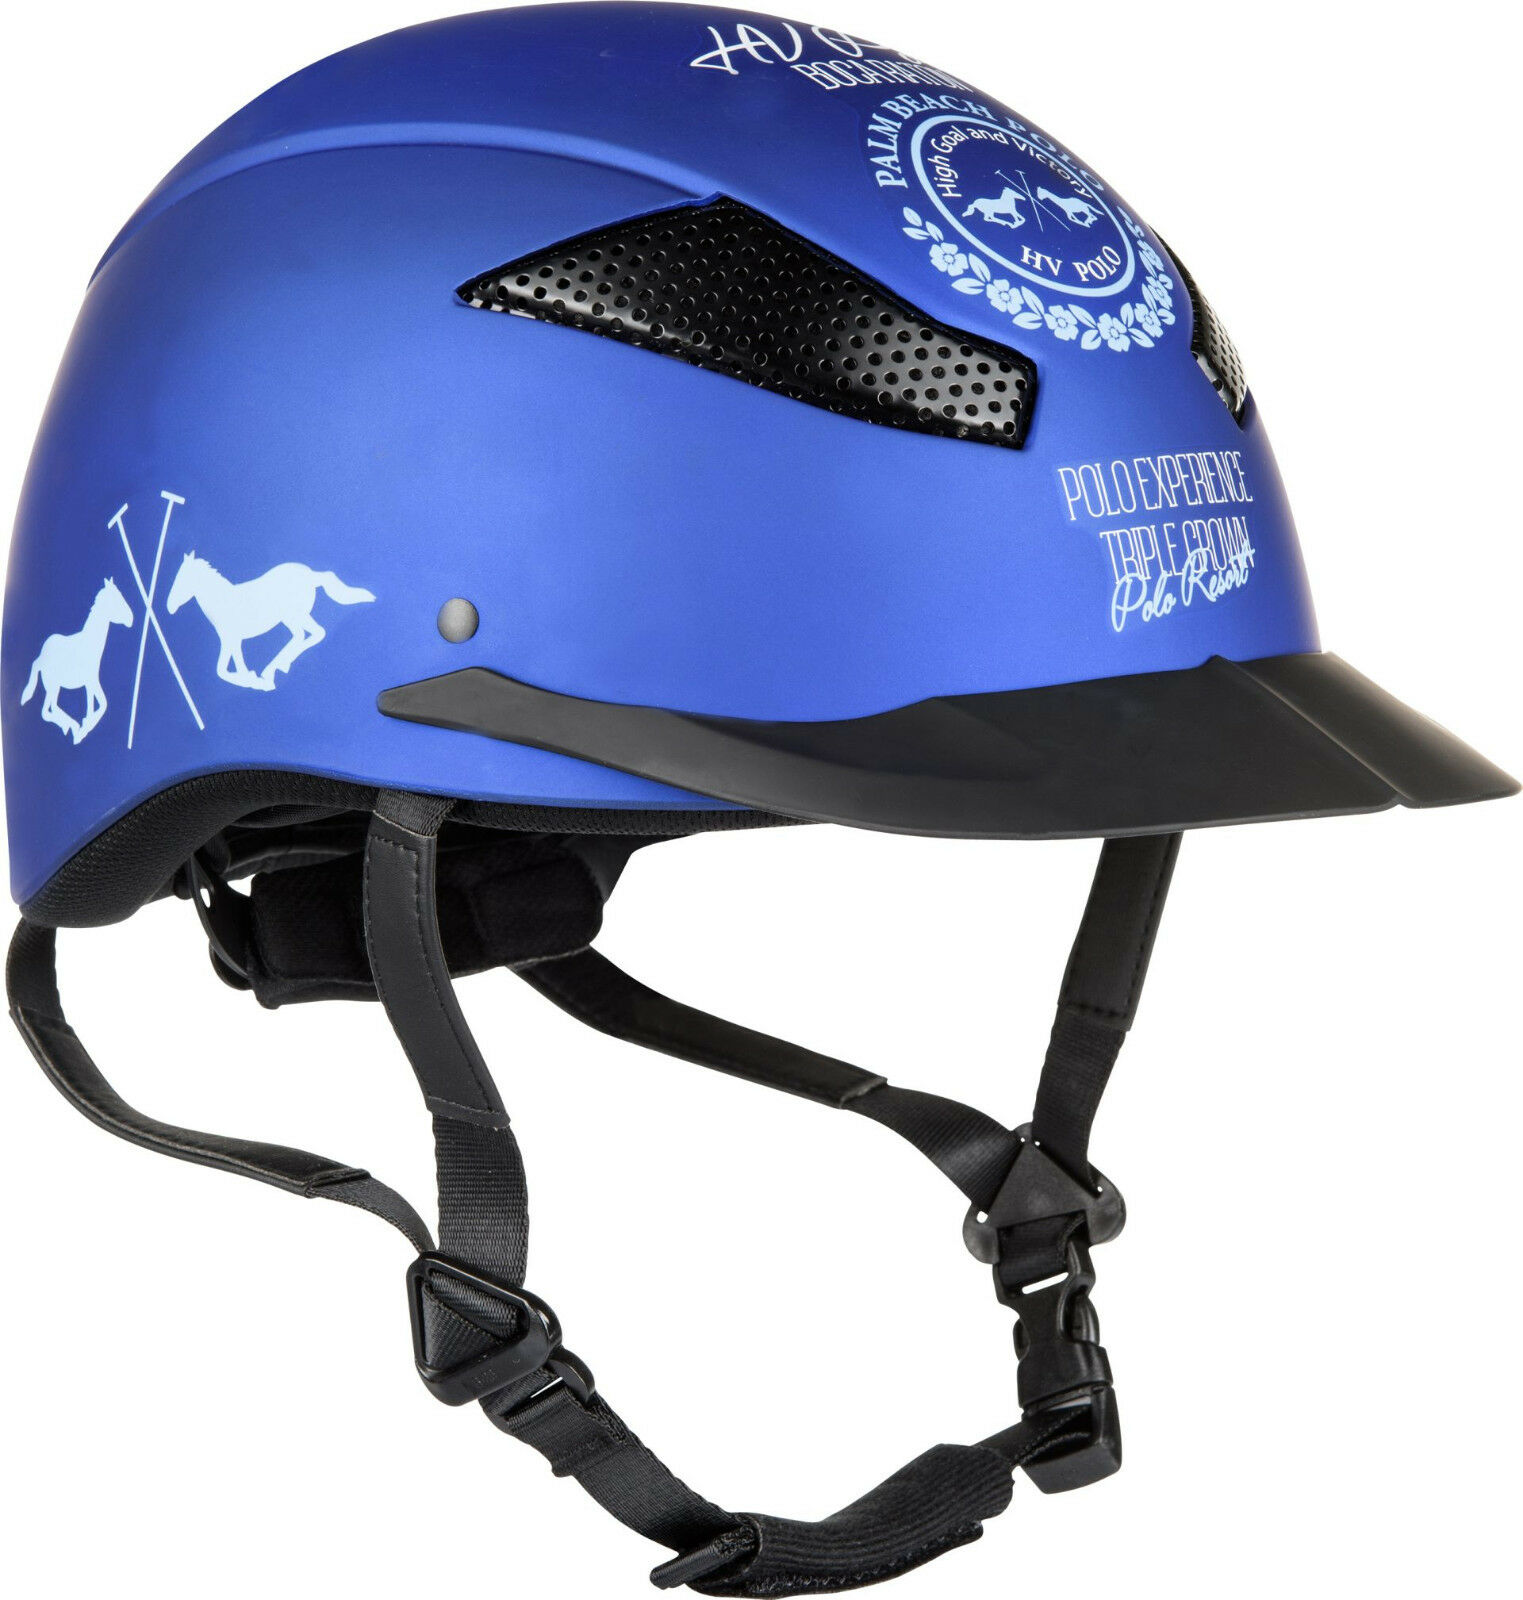 HV Polo Sicherheits-Reithelm Aberdeen CE VG1 01 01 01 040 2014-12 Coolmax 30d161